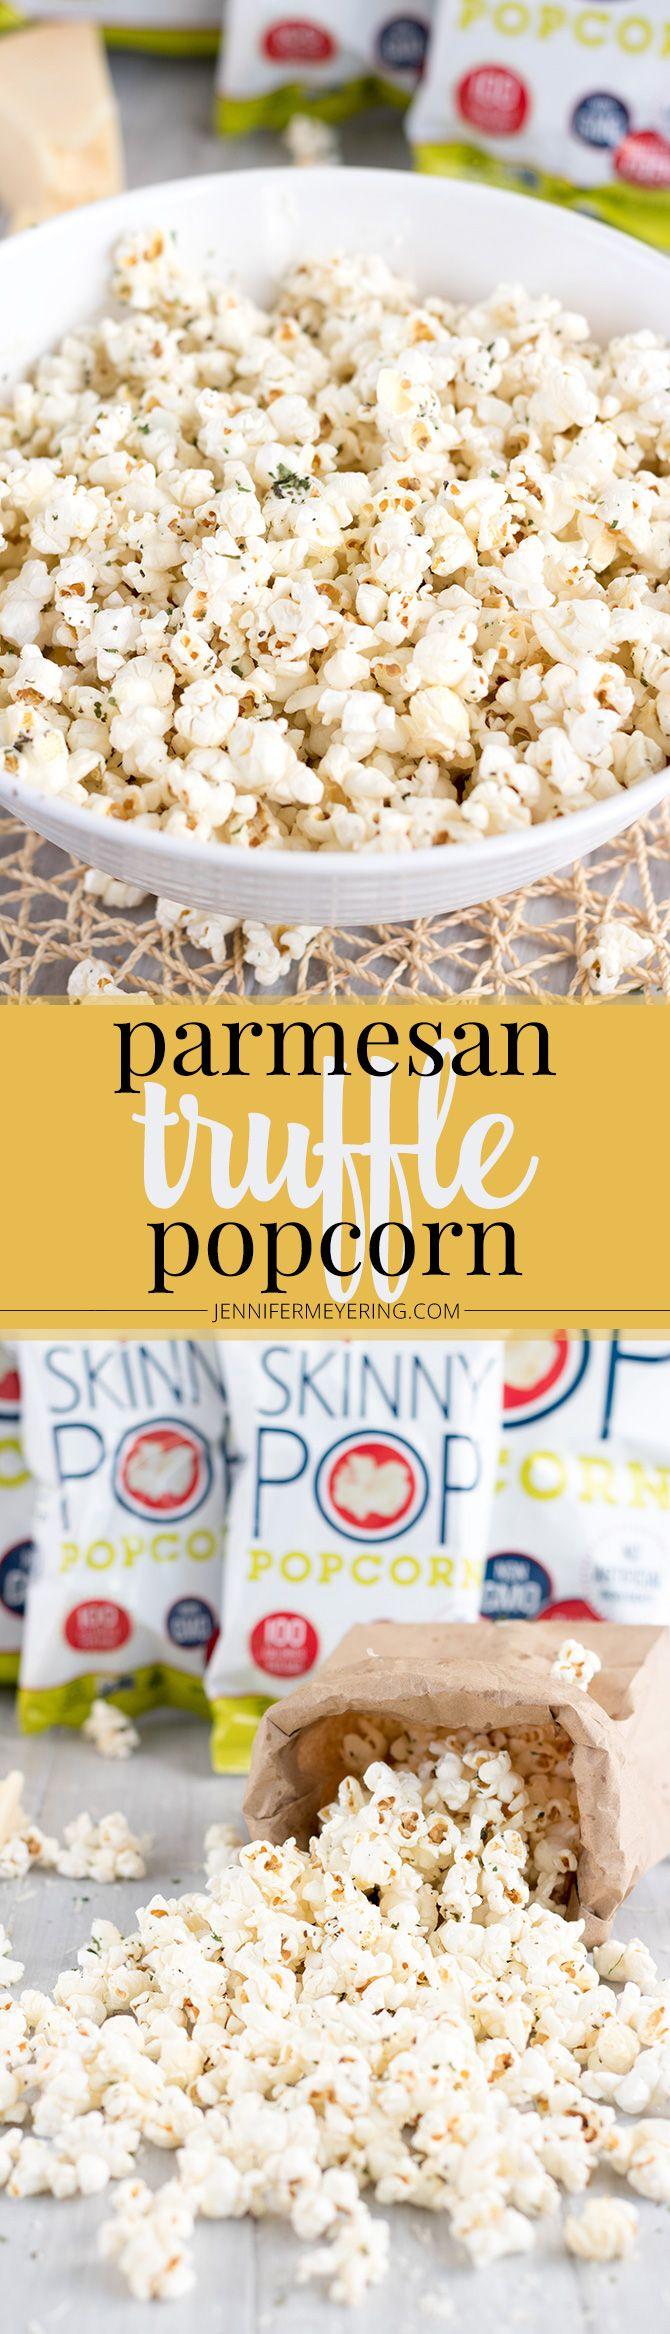 Parmesan Truffle Popcorn - JenniferMeyering.com